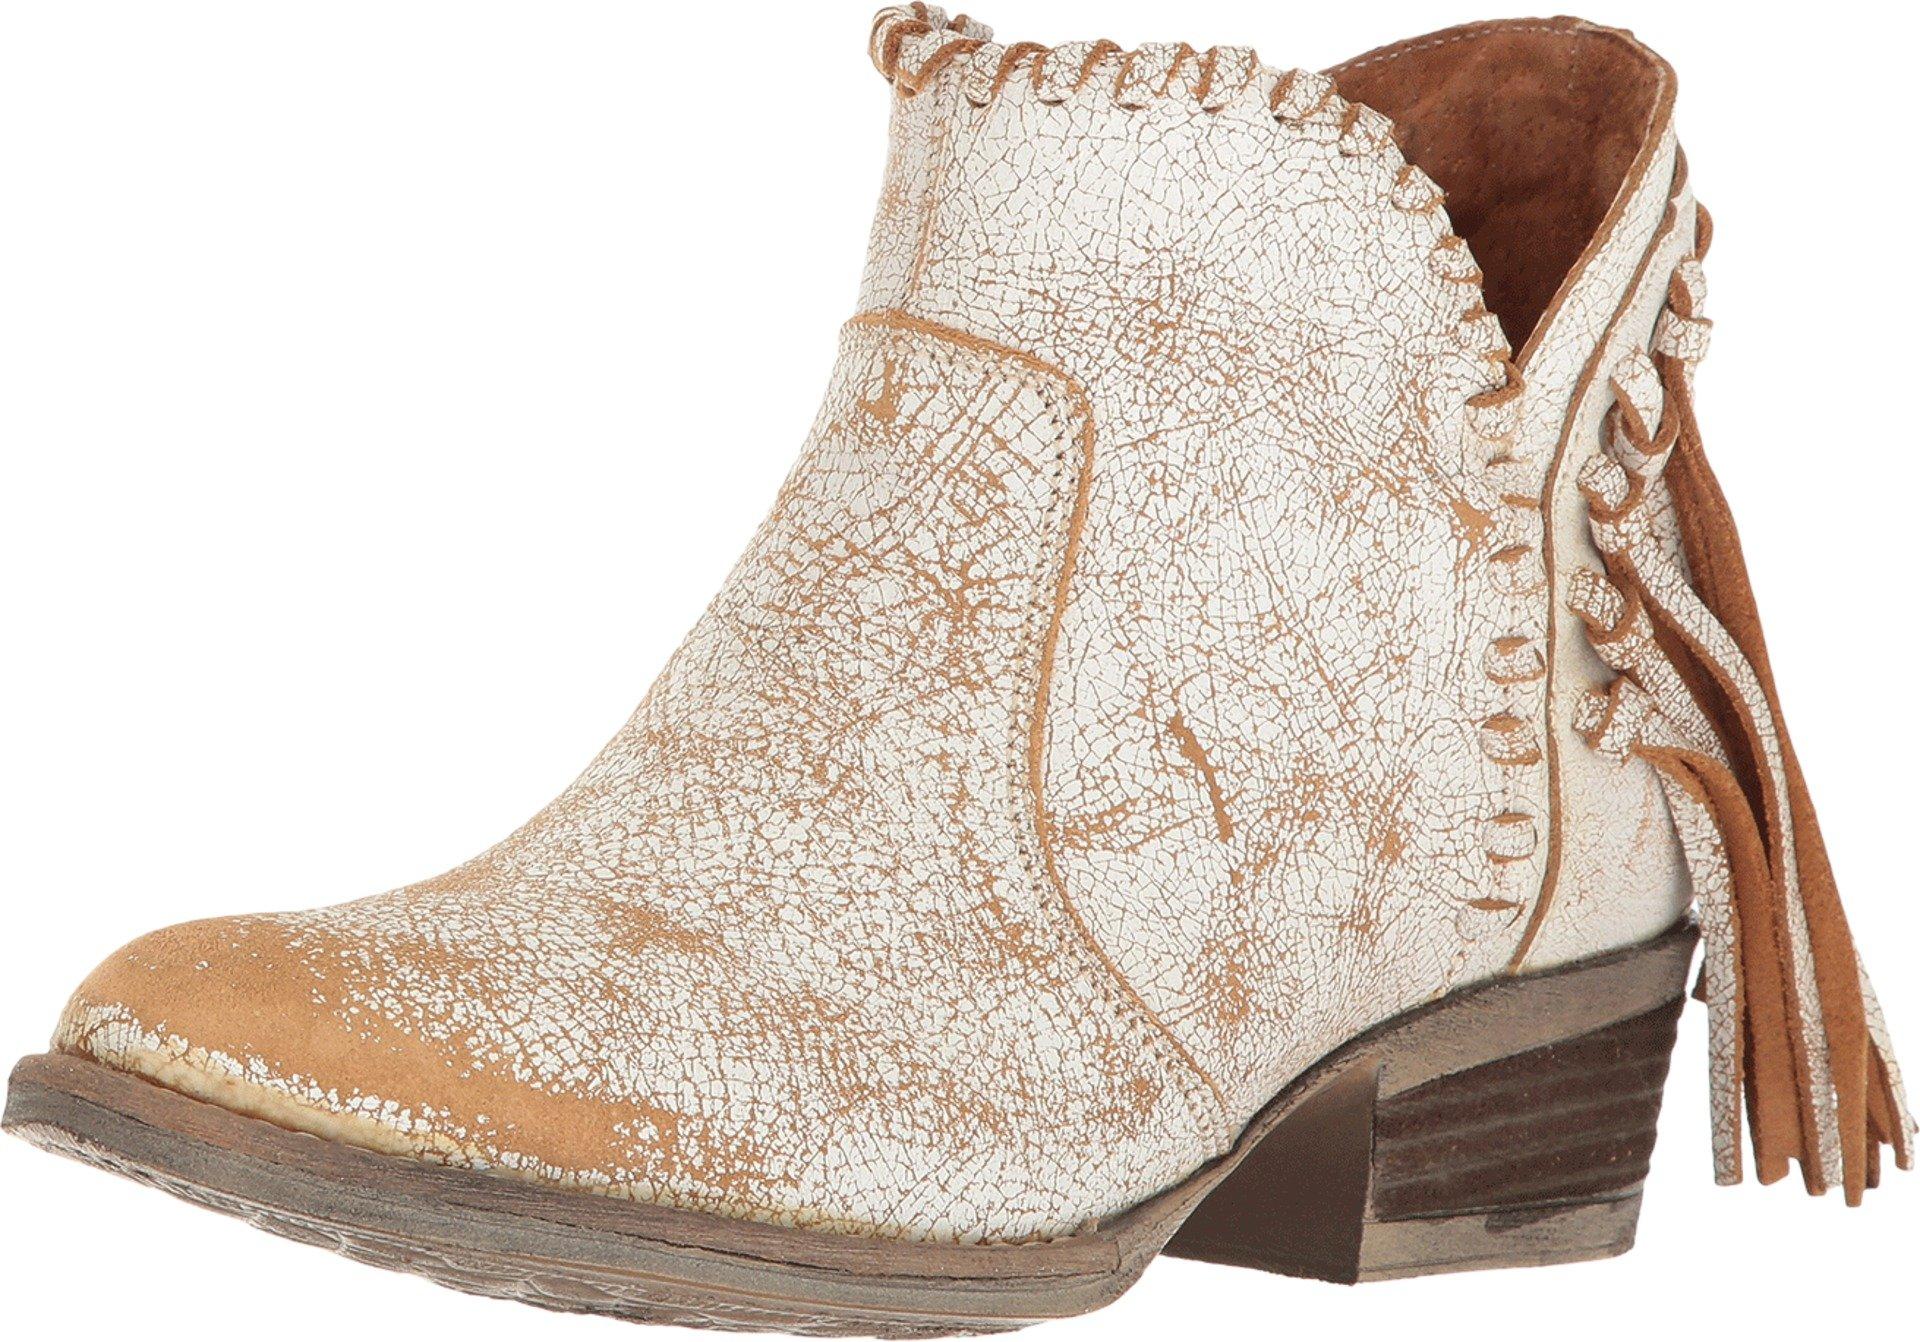 Corral Boots Women's Q0004 Tan/White Boot